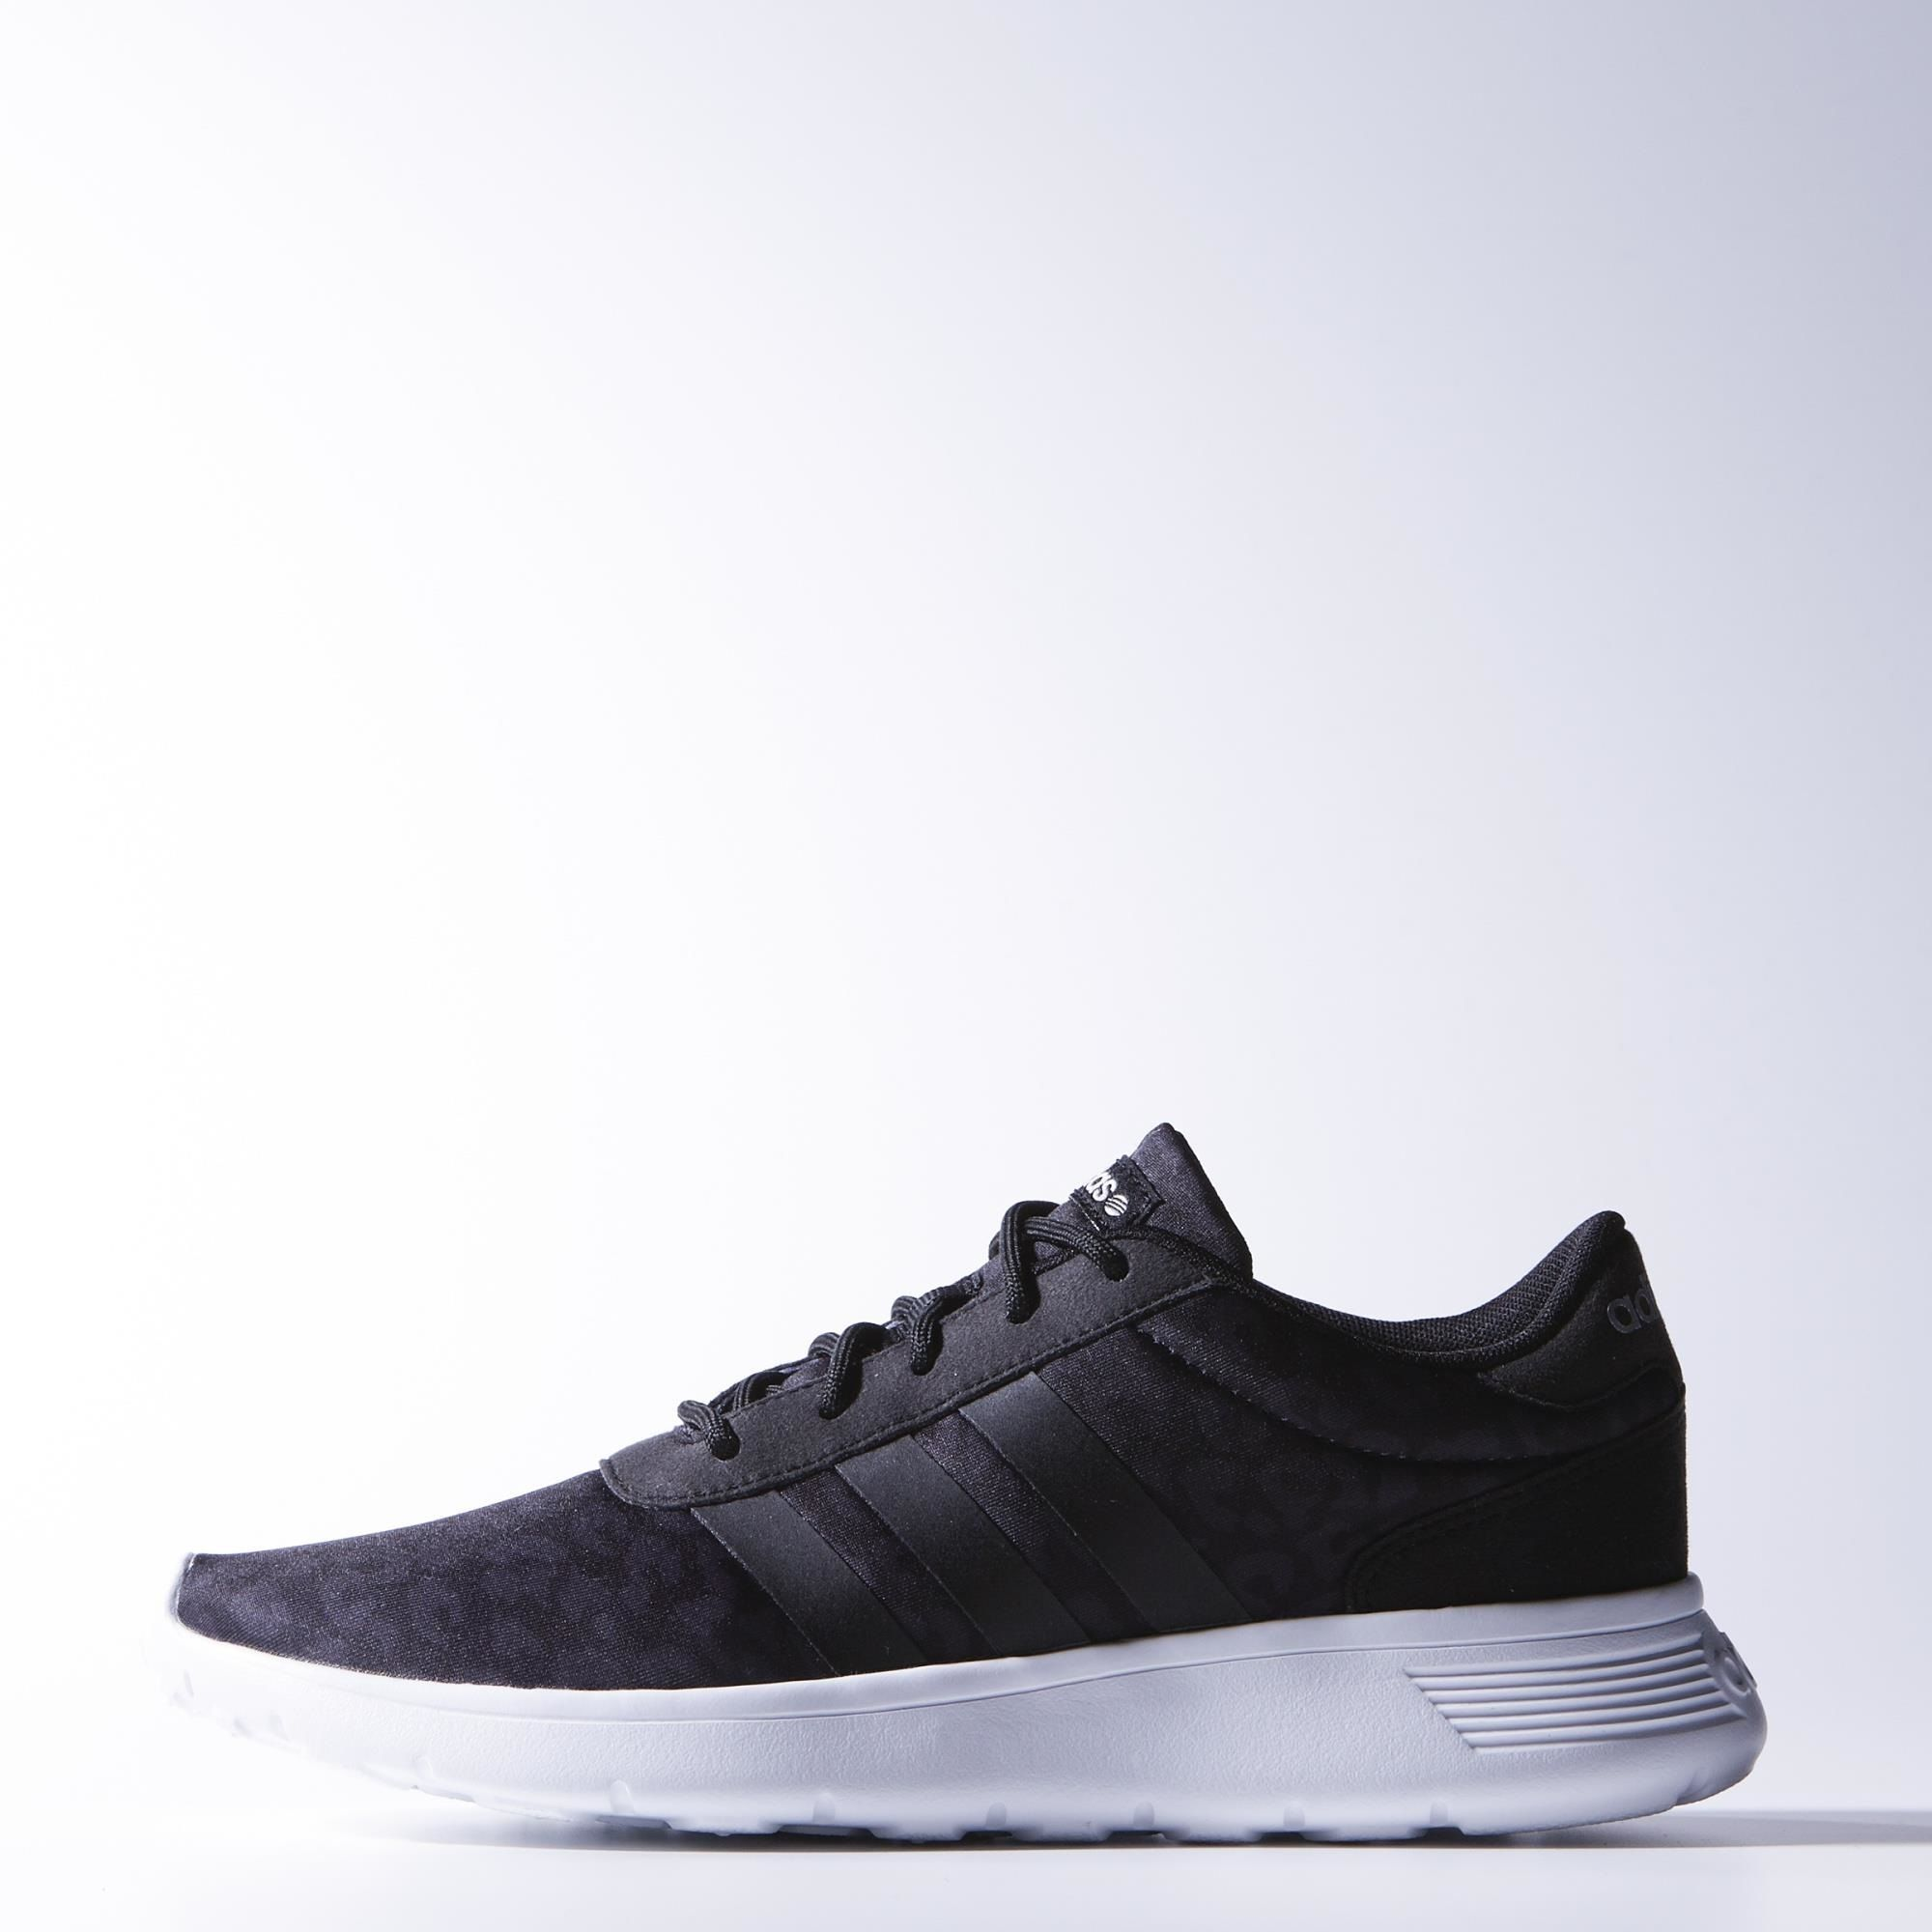 adidas schuhe weiss schwarz fairy